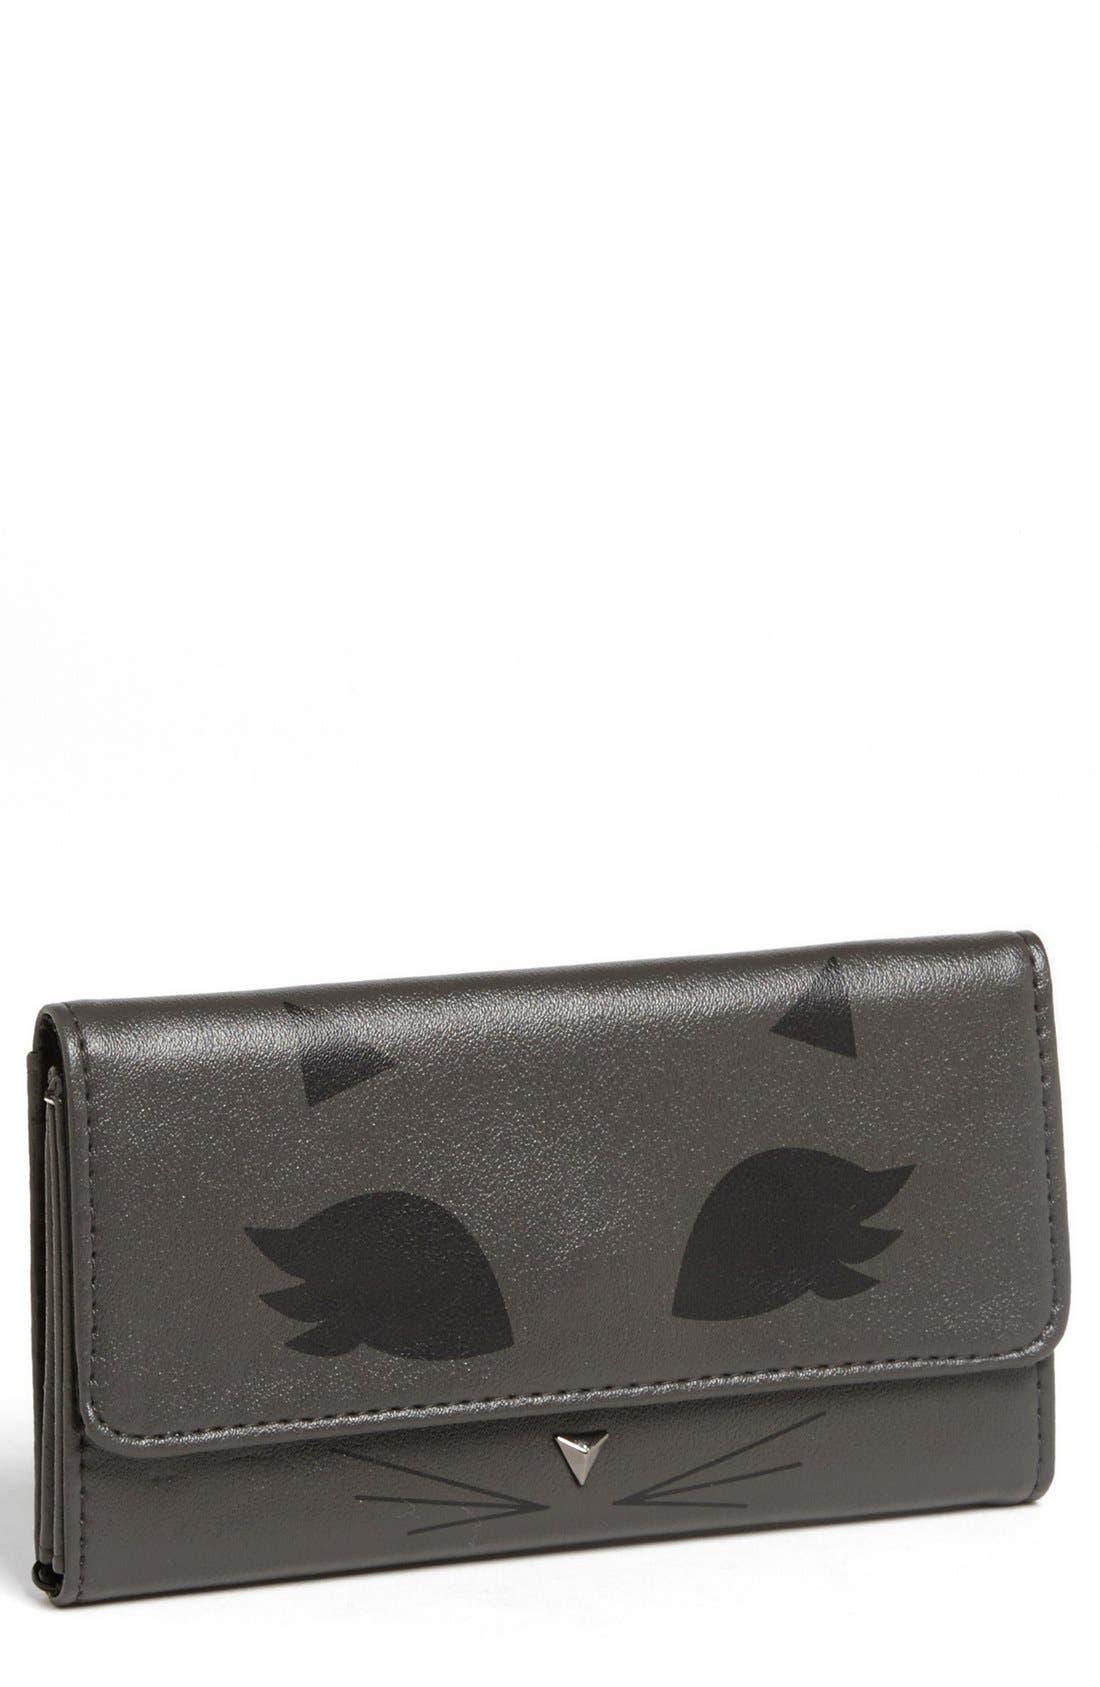 Main Image - Lulu 'Cat' Faux Leather Wallet